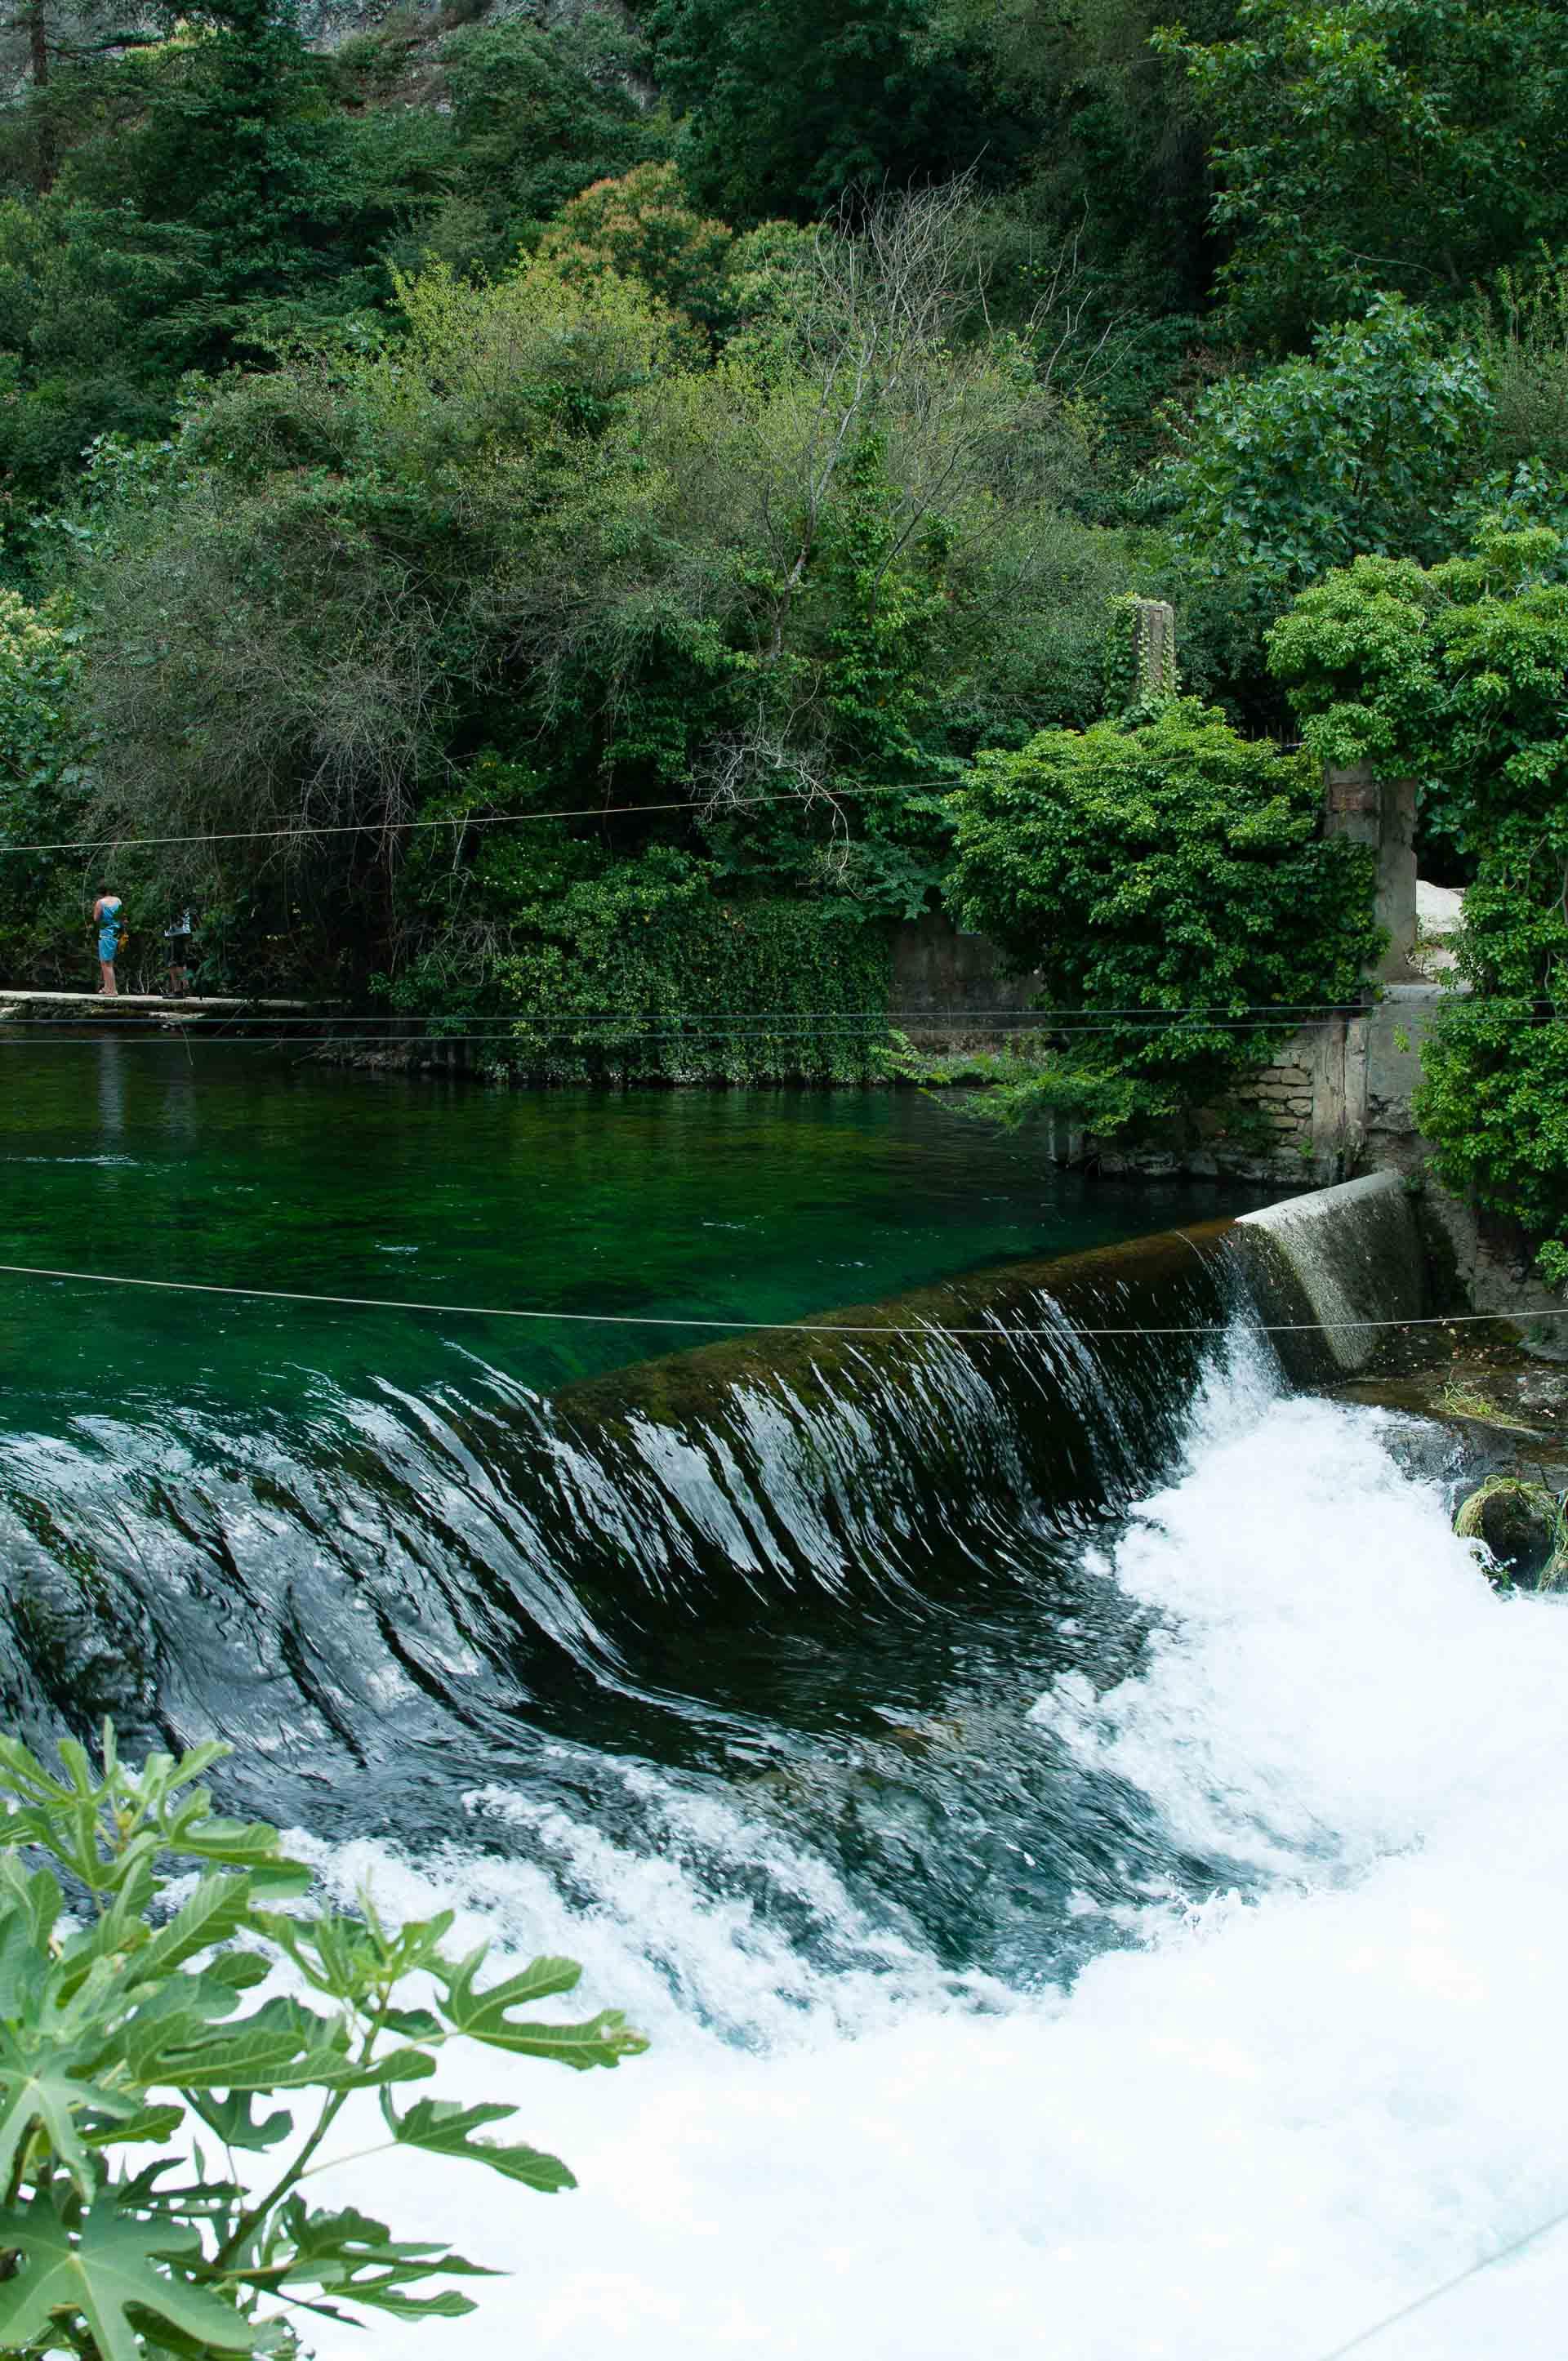 Fontaine de Vaucluse fiume